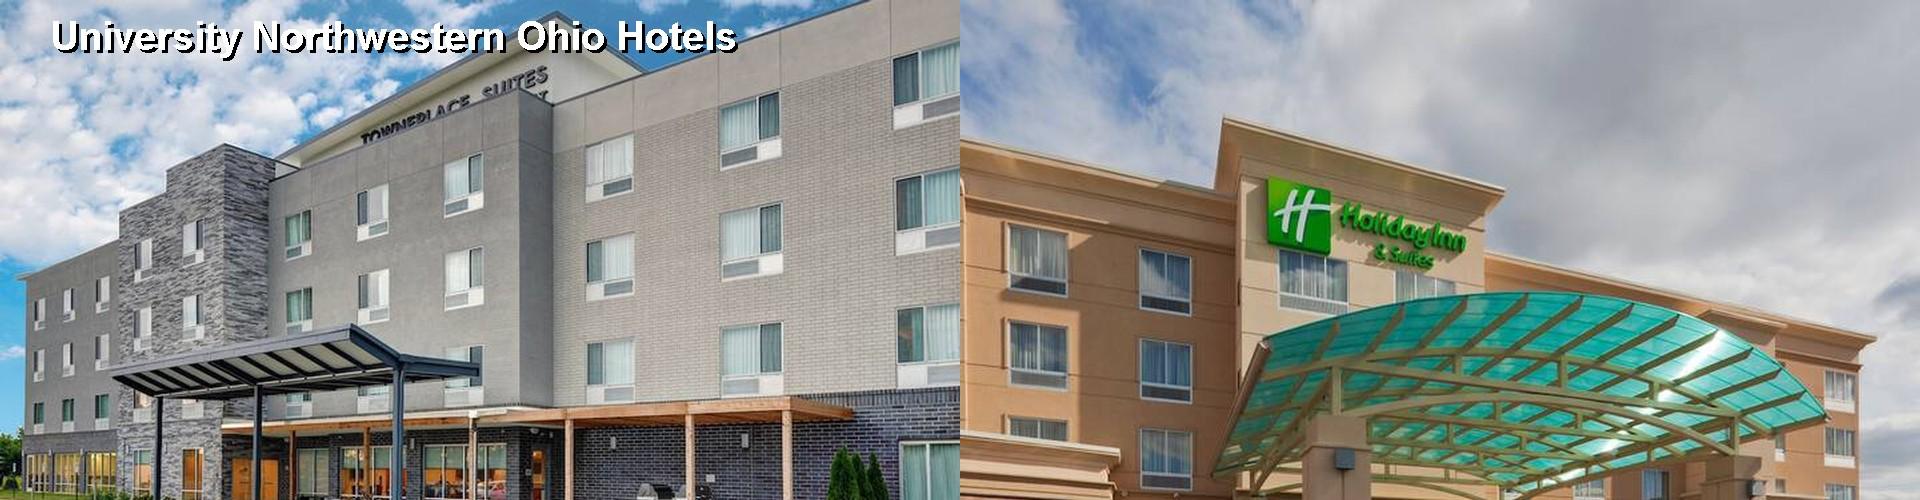 5 Best Hotels Near University Northwestern Ohio